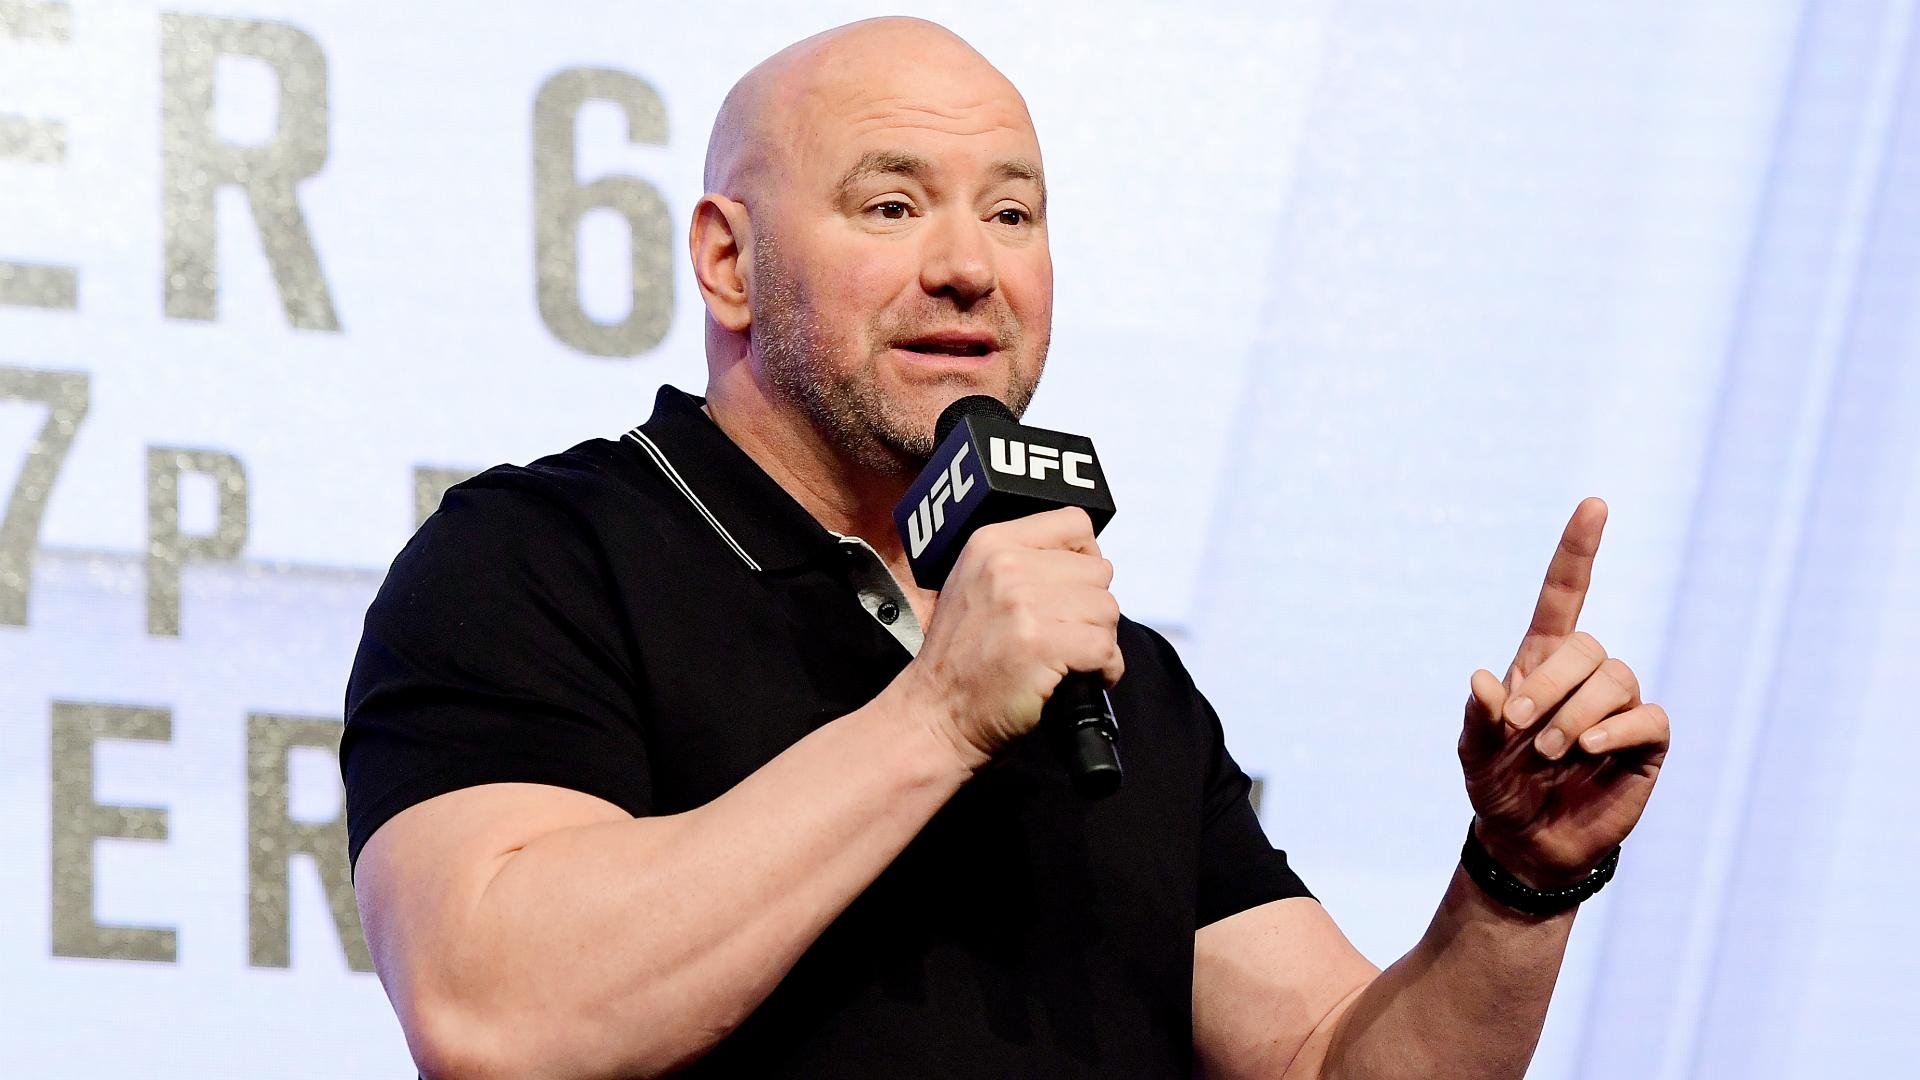 Coronavirus: Someone had to take the first step - Dana White explains UFC decision